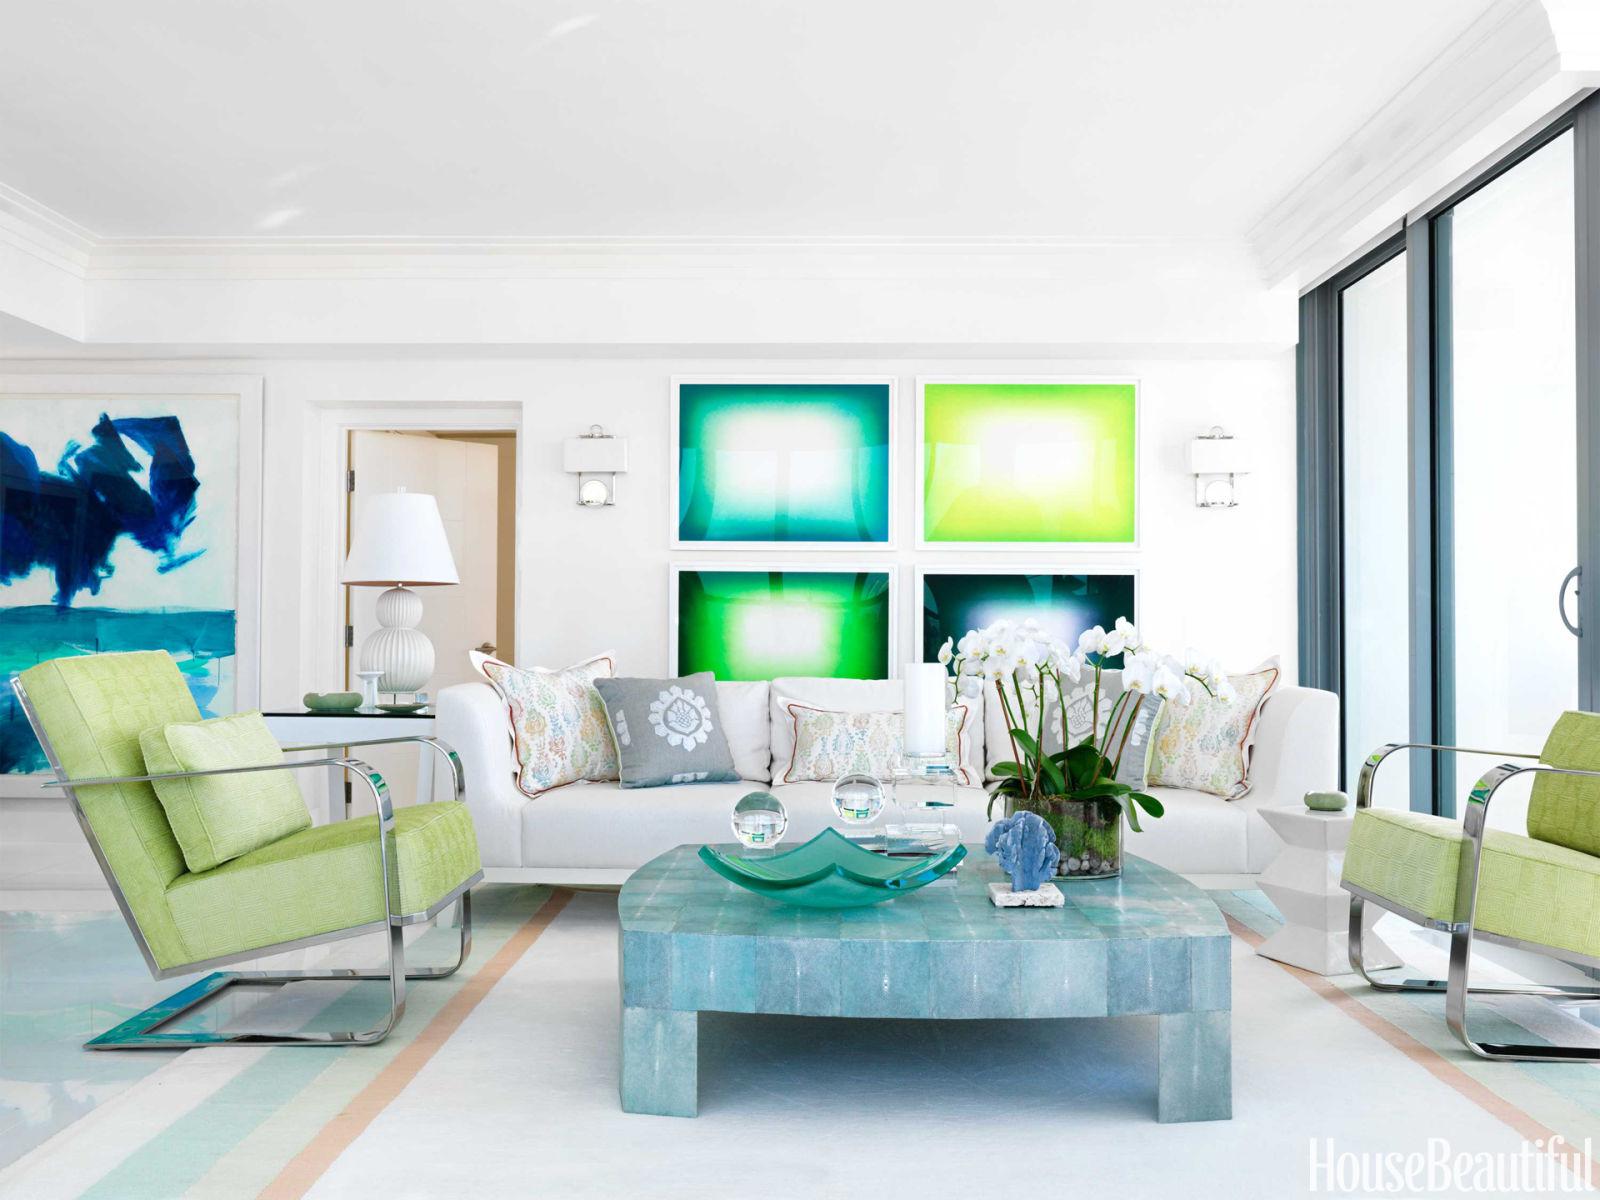 50 best living room design ideas for 2016 for Best living room designs 2016